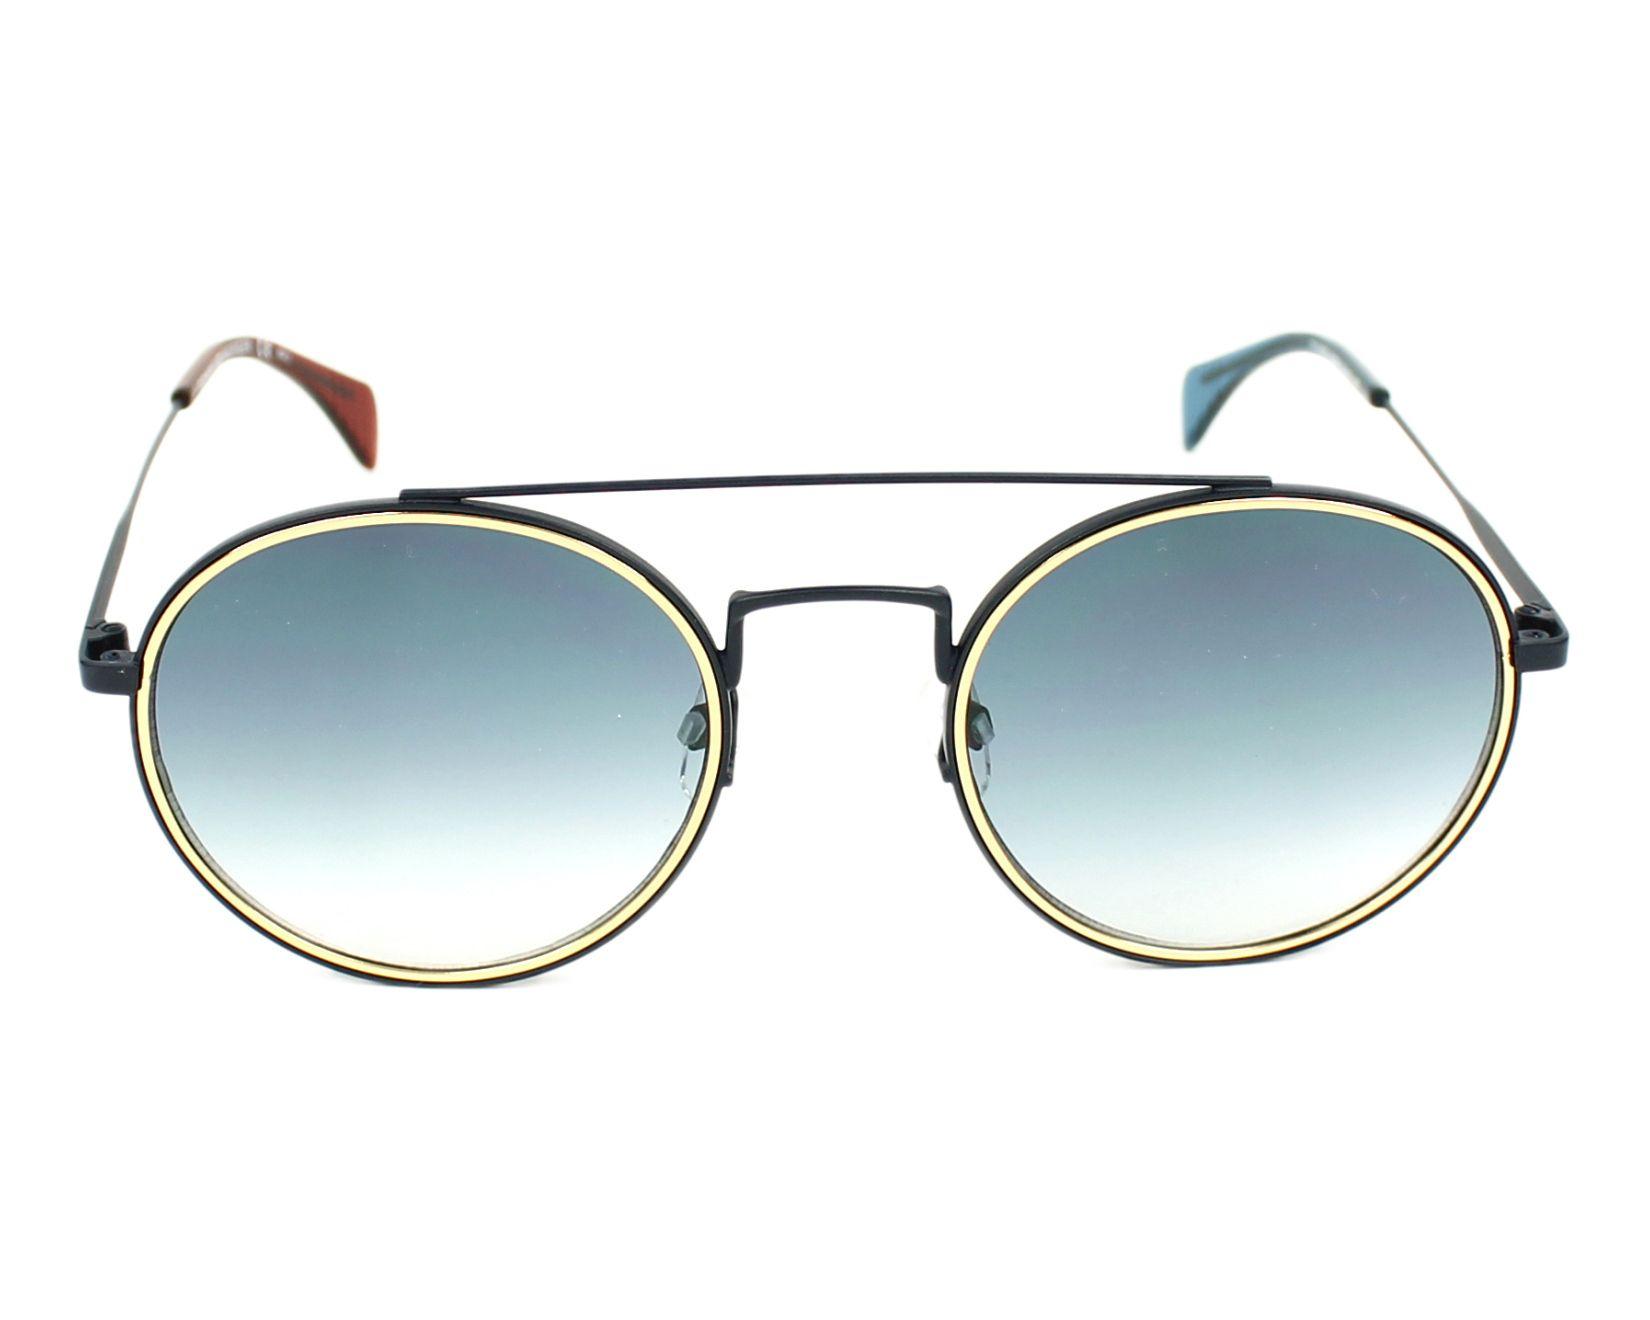 3bf39366bcf25 Sunglasses Tommy Hilfiger TH-1455-S BQZ 08 53-22 Blue Gold